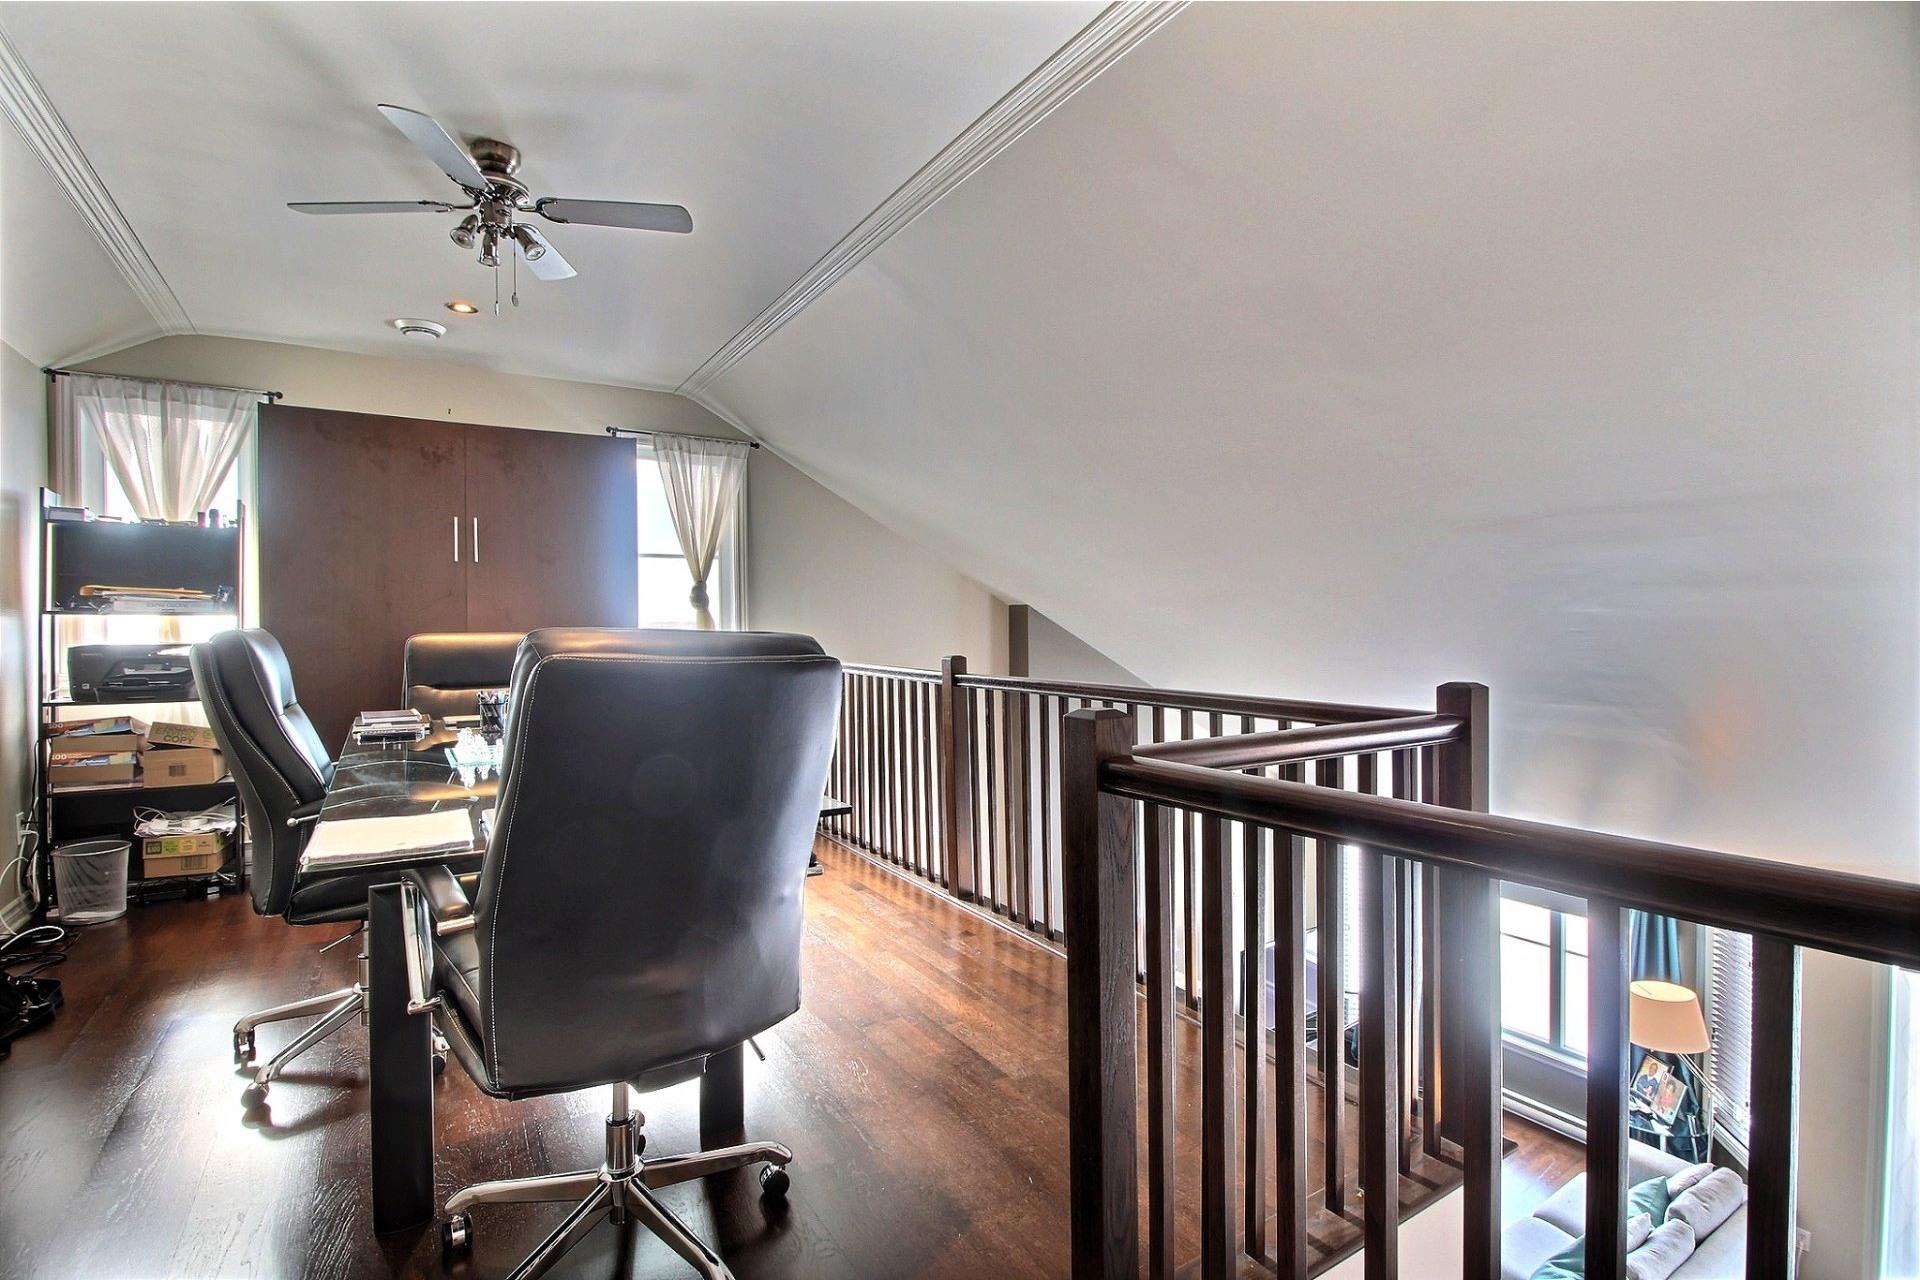 image 15 - Apartment For sale Longueuil Saint-Hubert  - 6 rooms